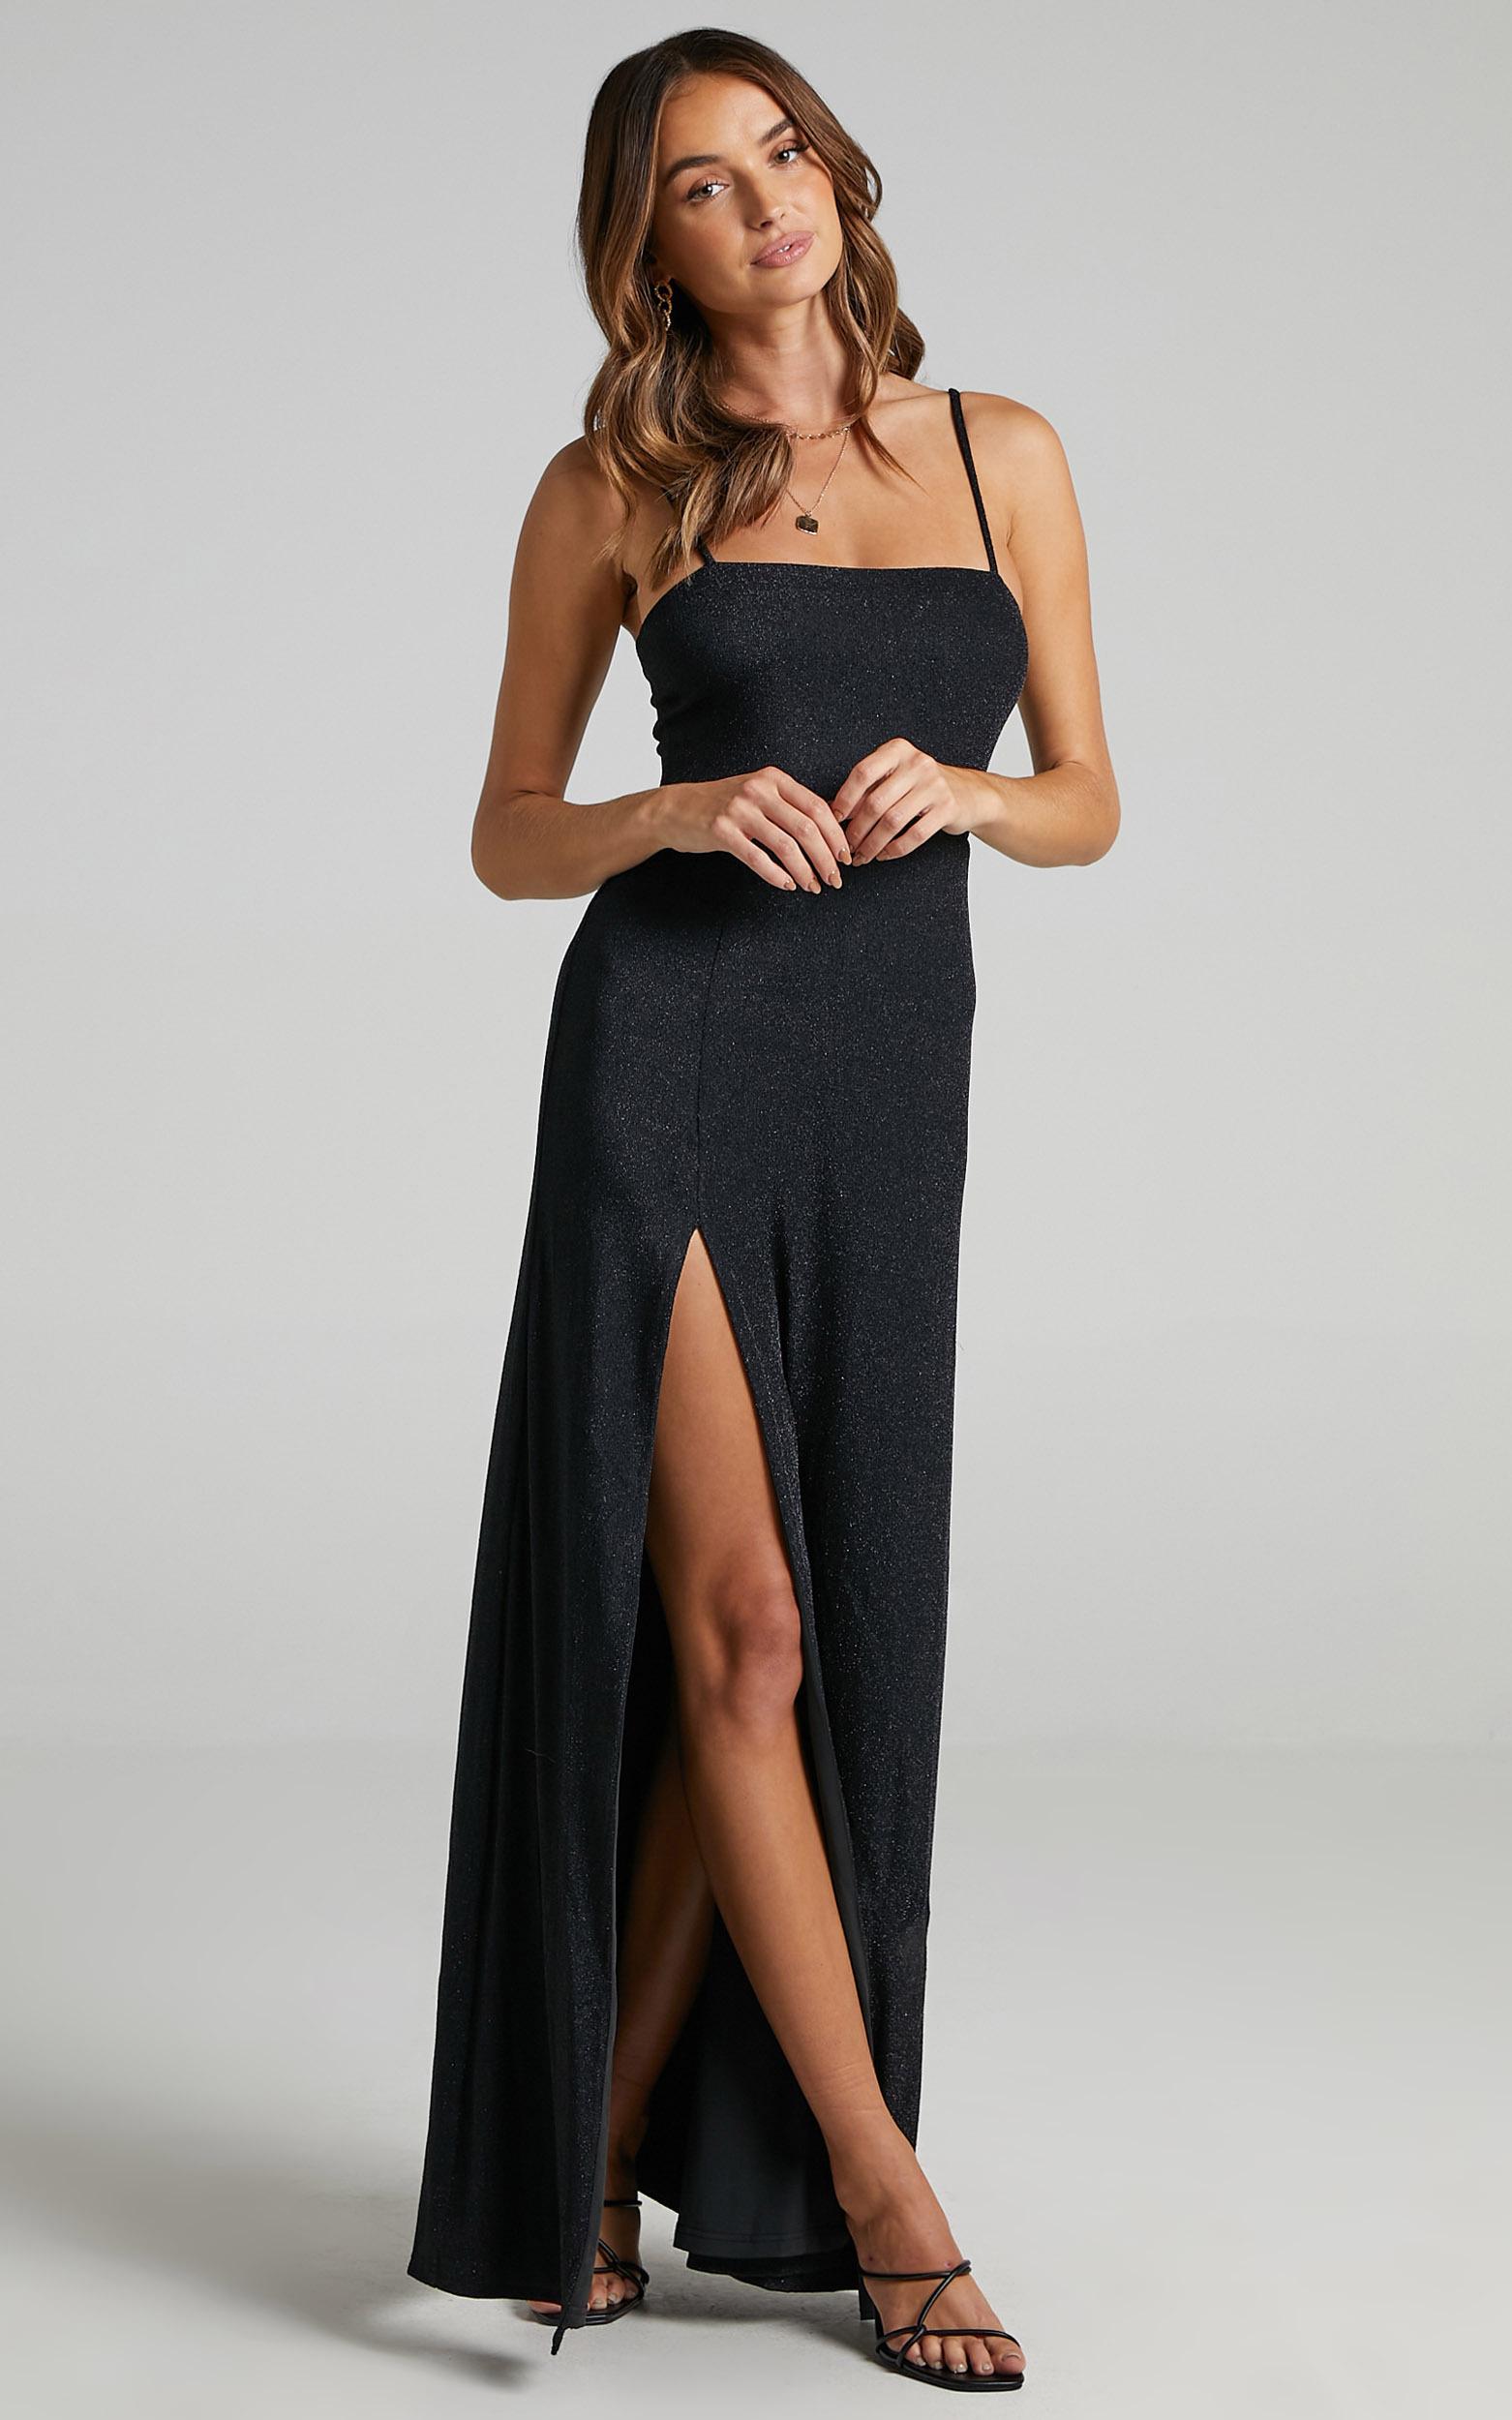 Rheannon Split Mesh Maxi Dress in Black Lurex - 06, BLK1, hi-res image number null